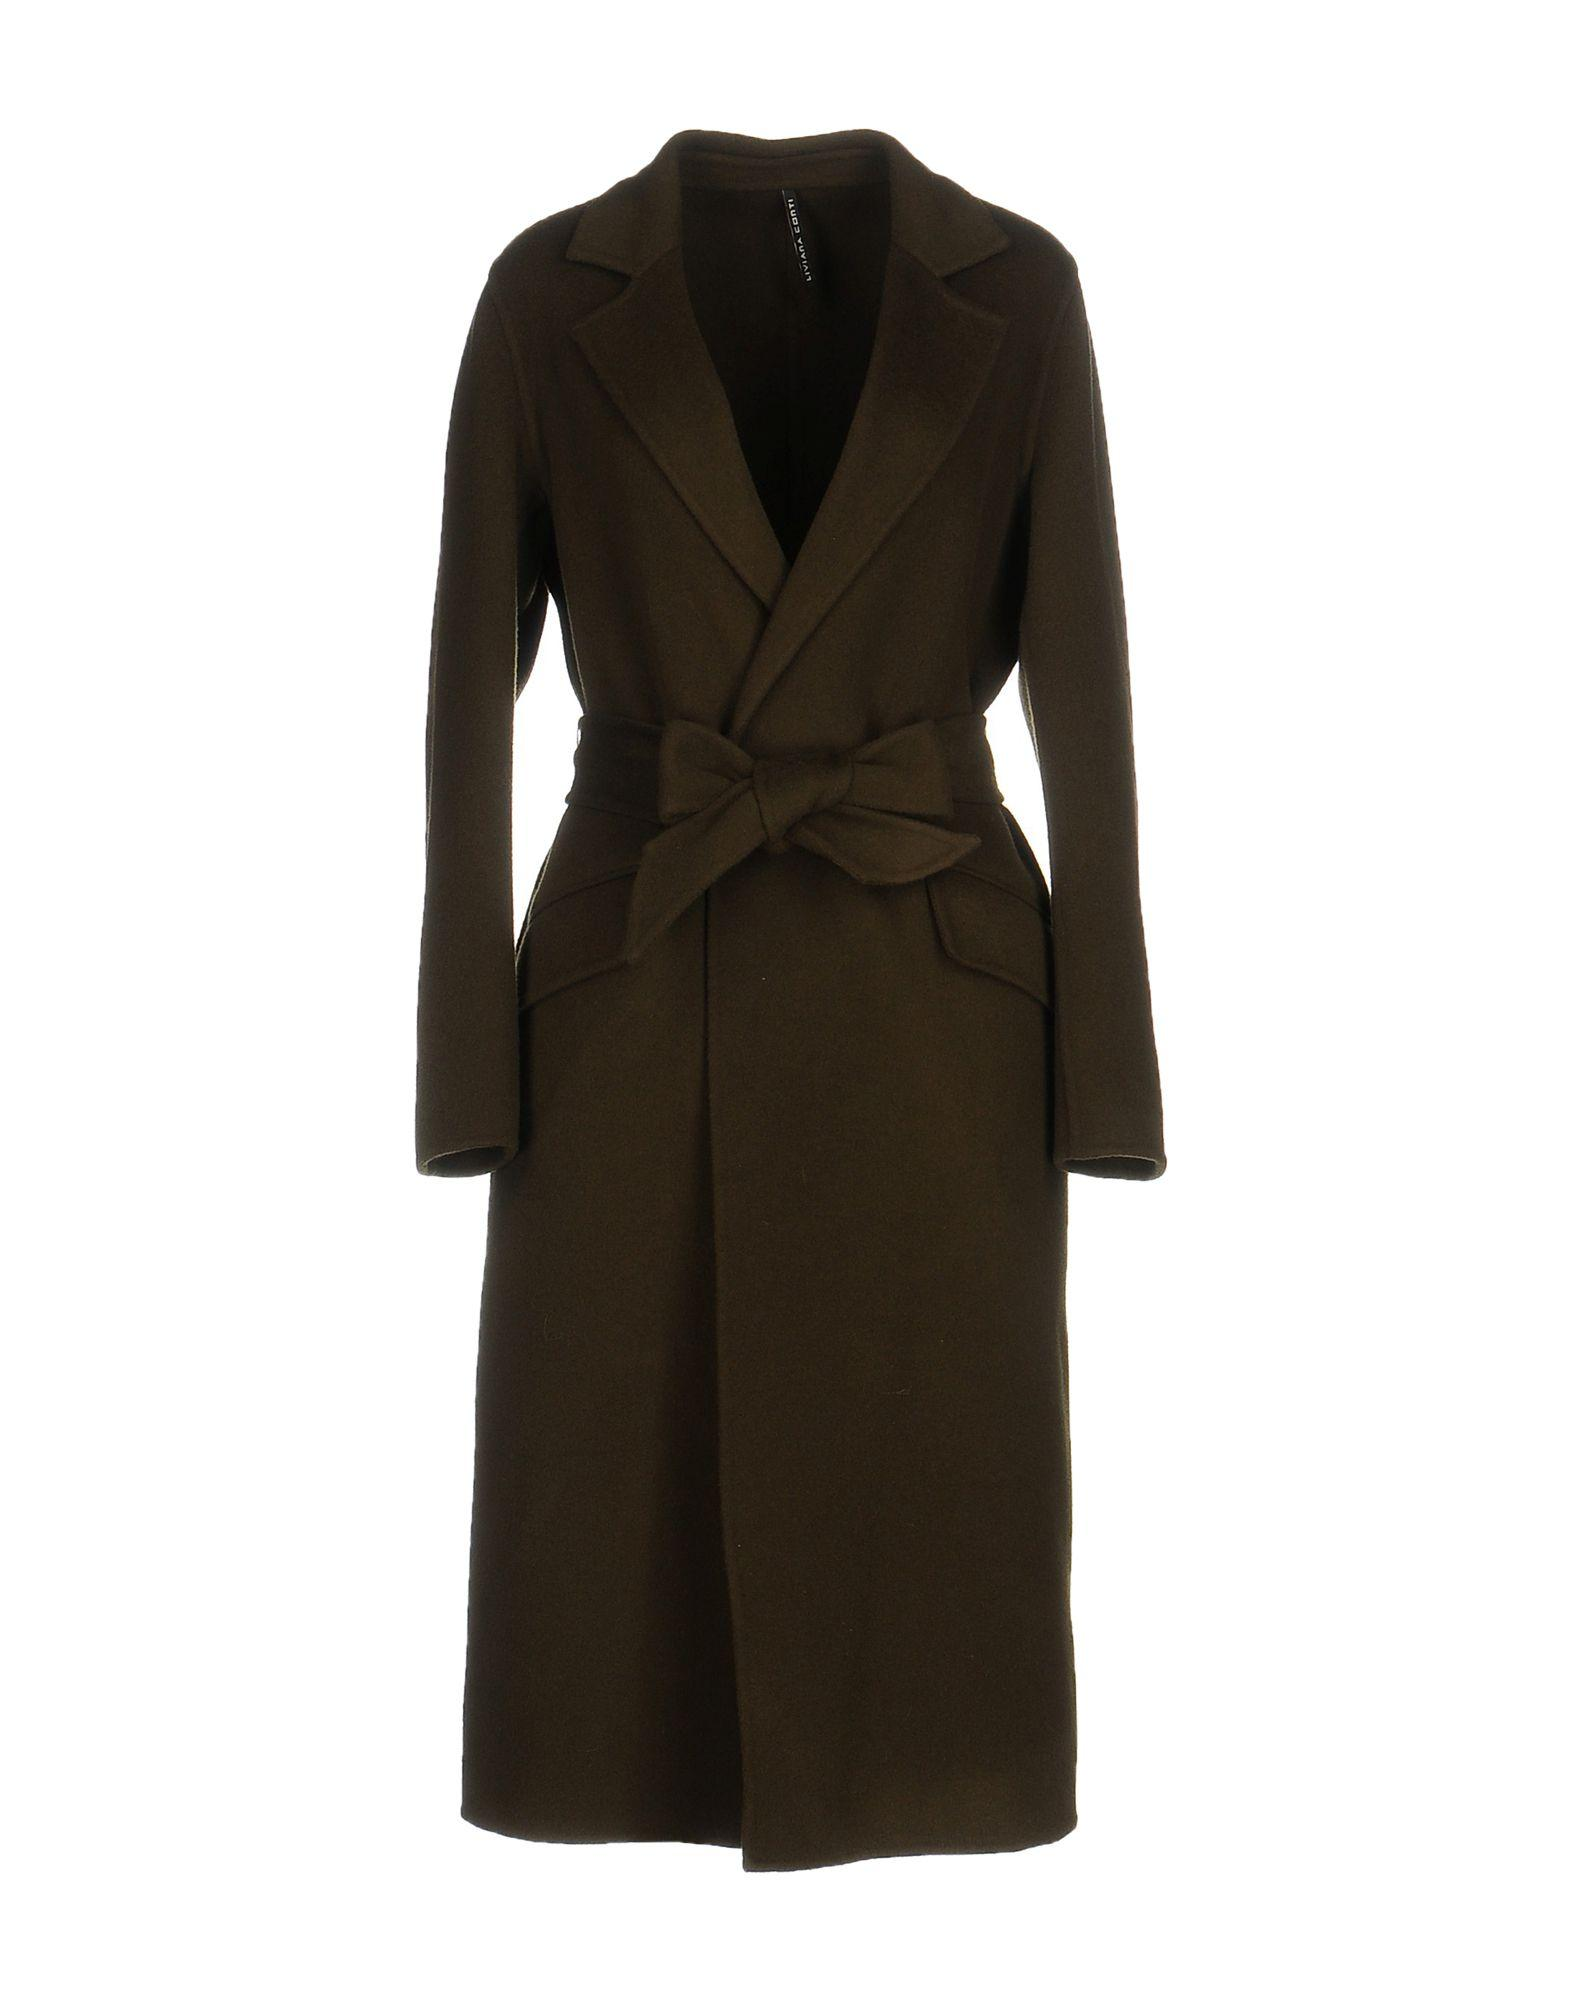 Liviana Conti Coat In Military Green